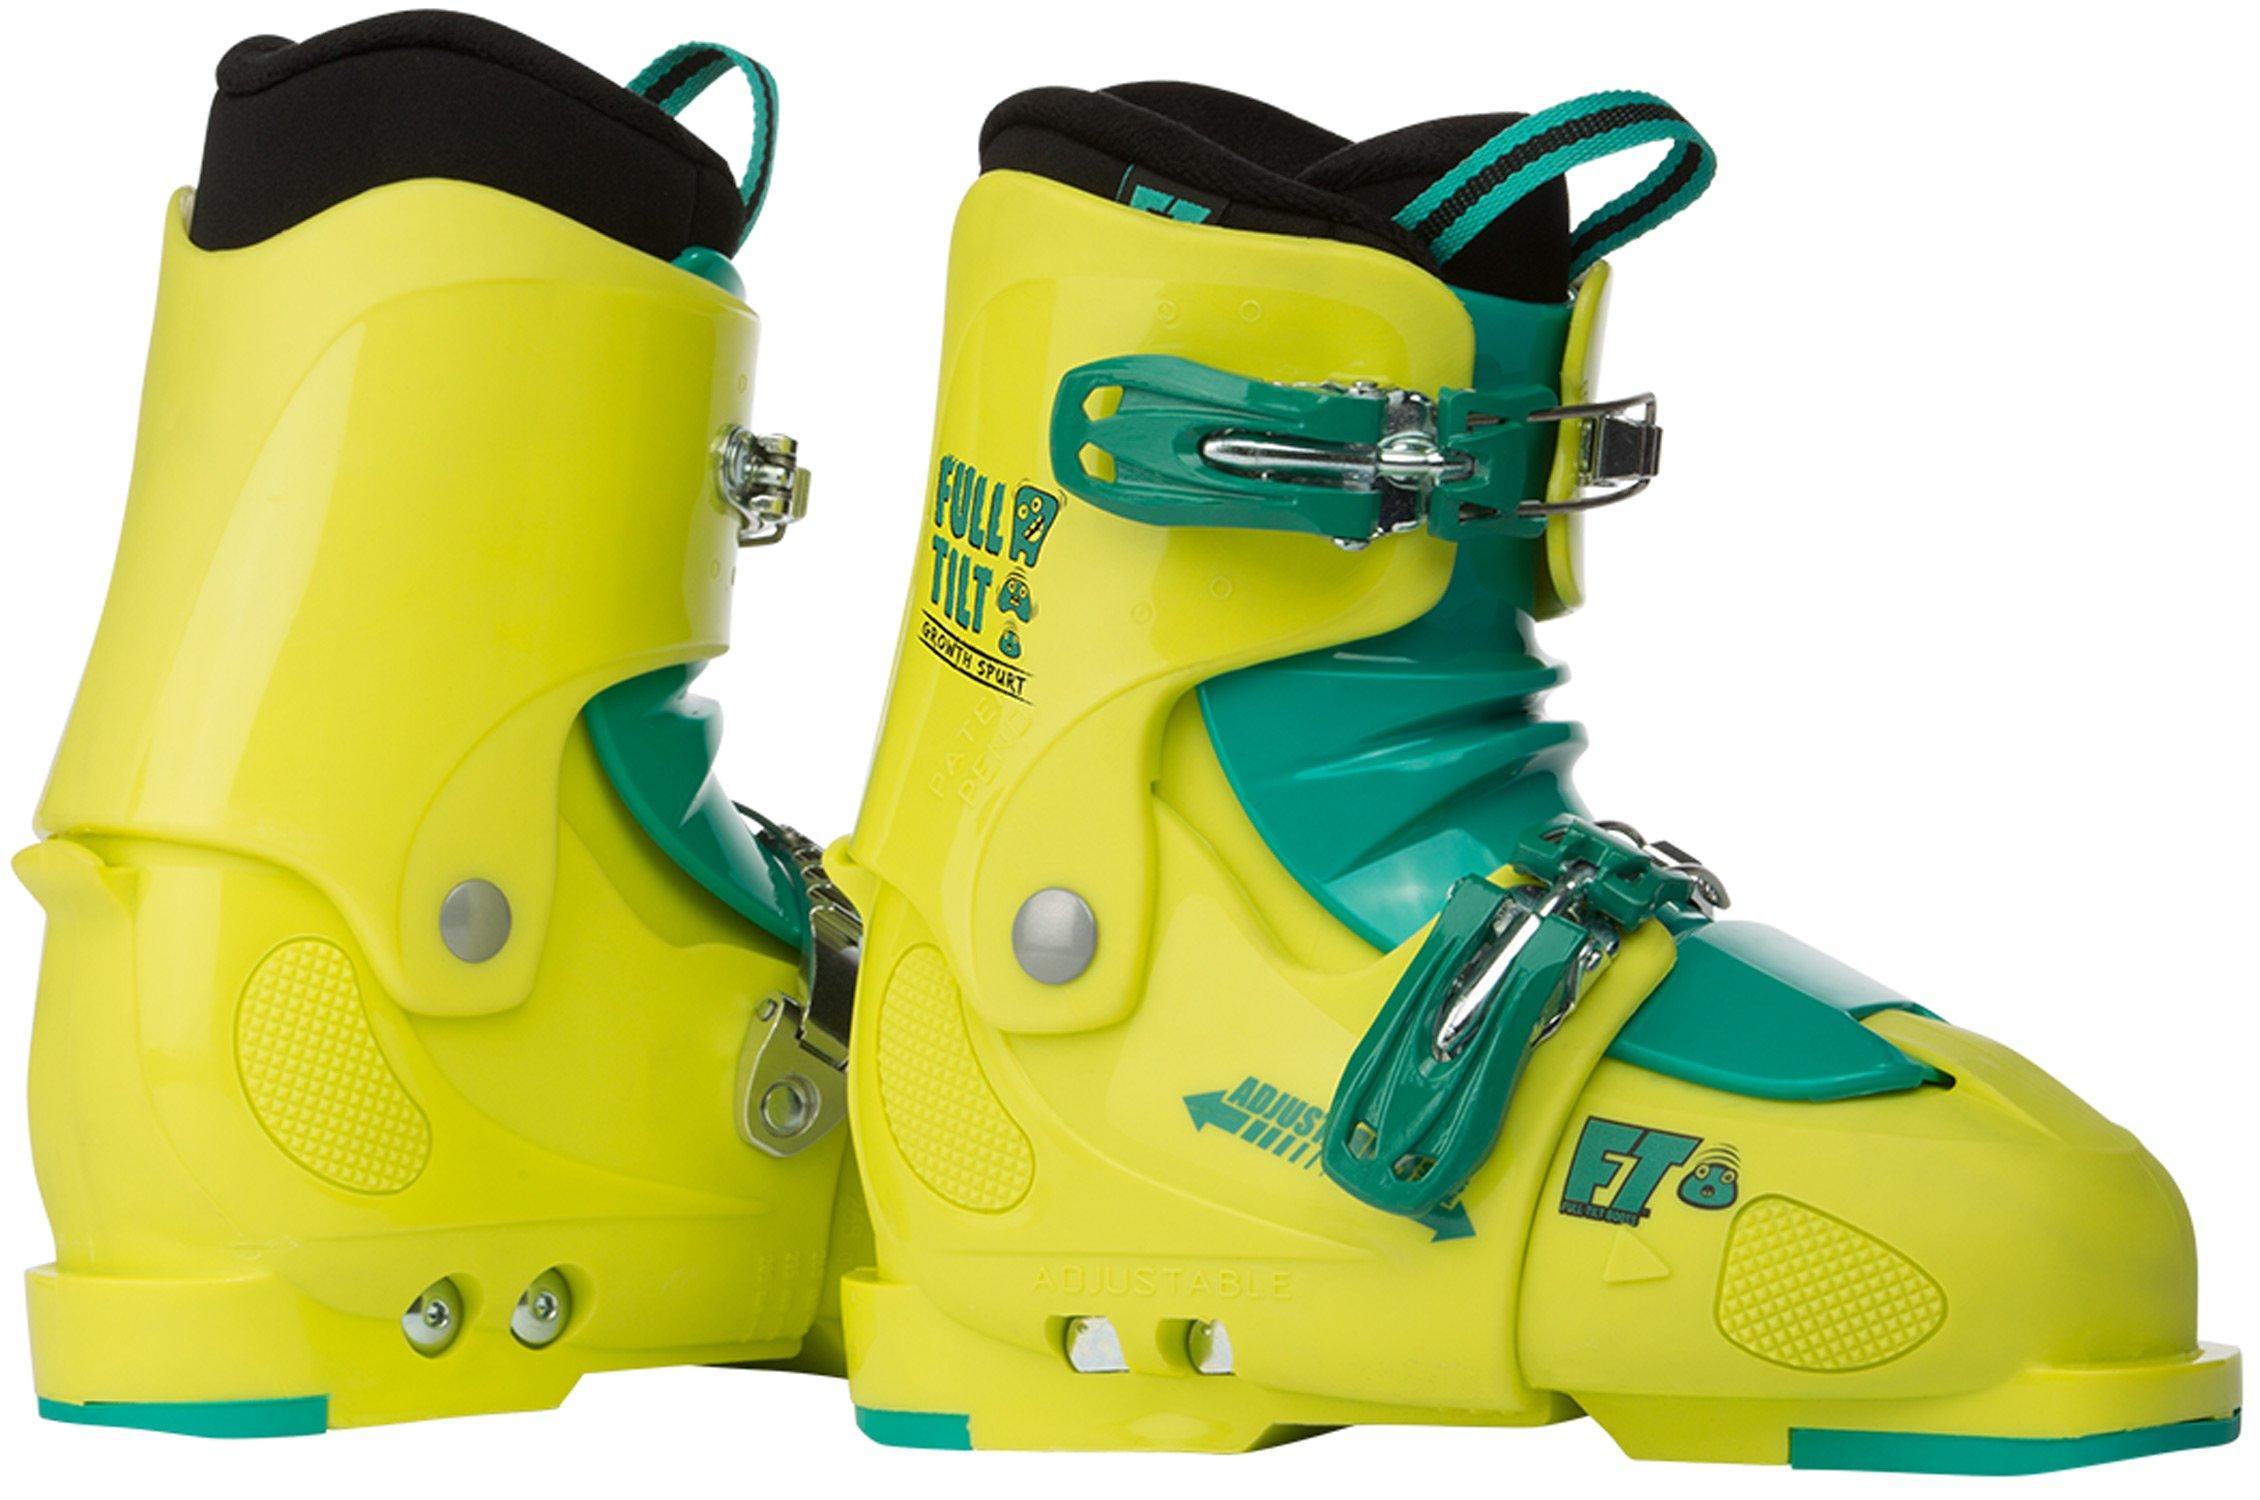 Full Tilt Growth Spurt Ski Boots Kids